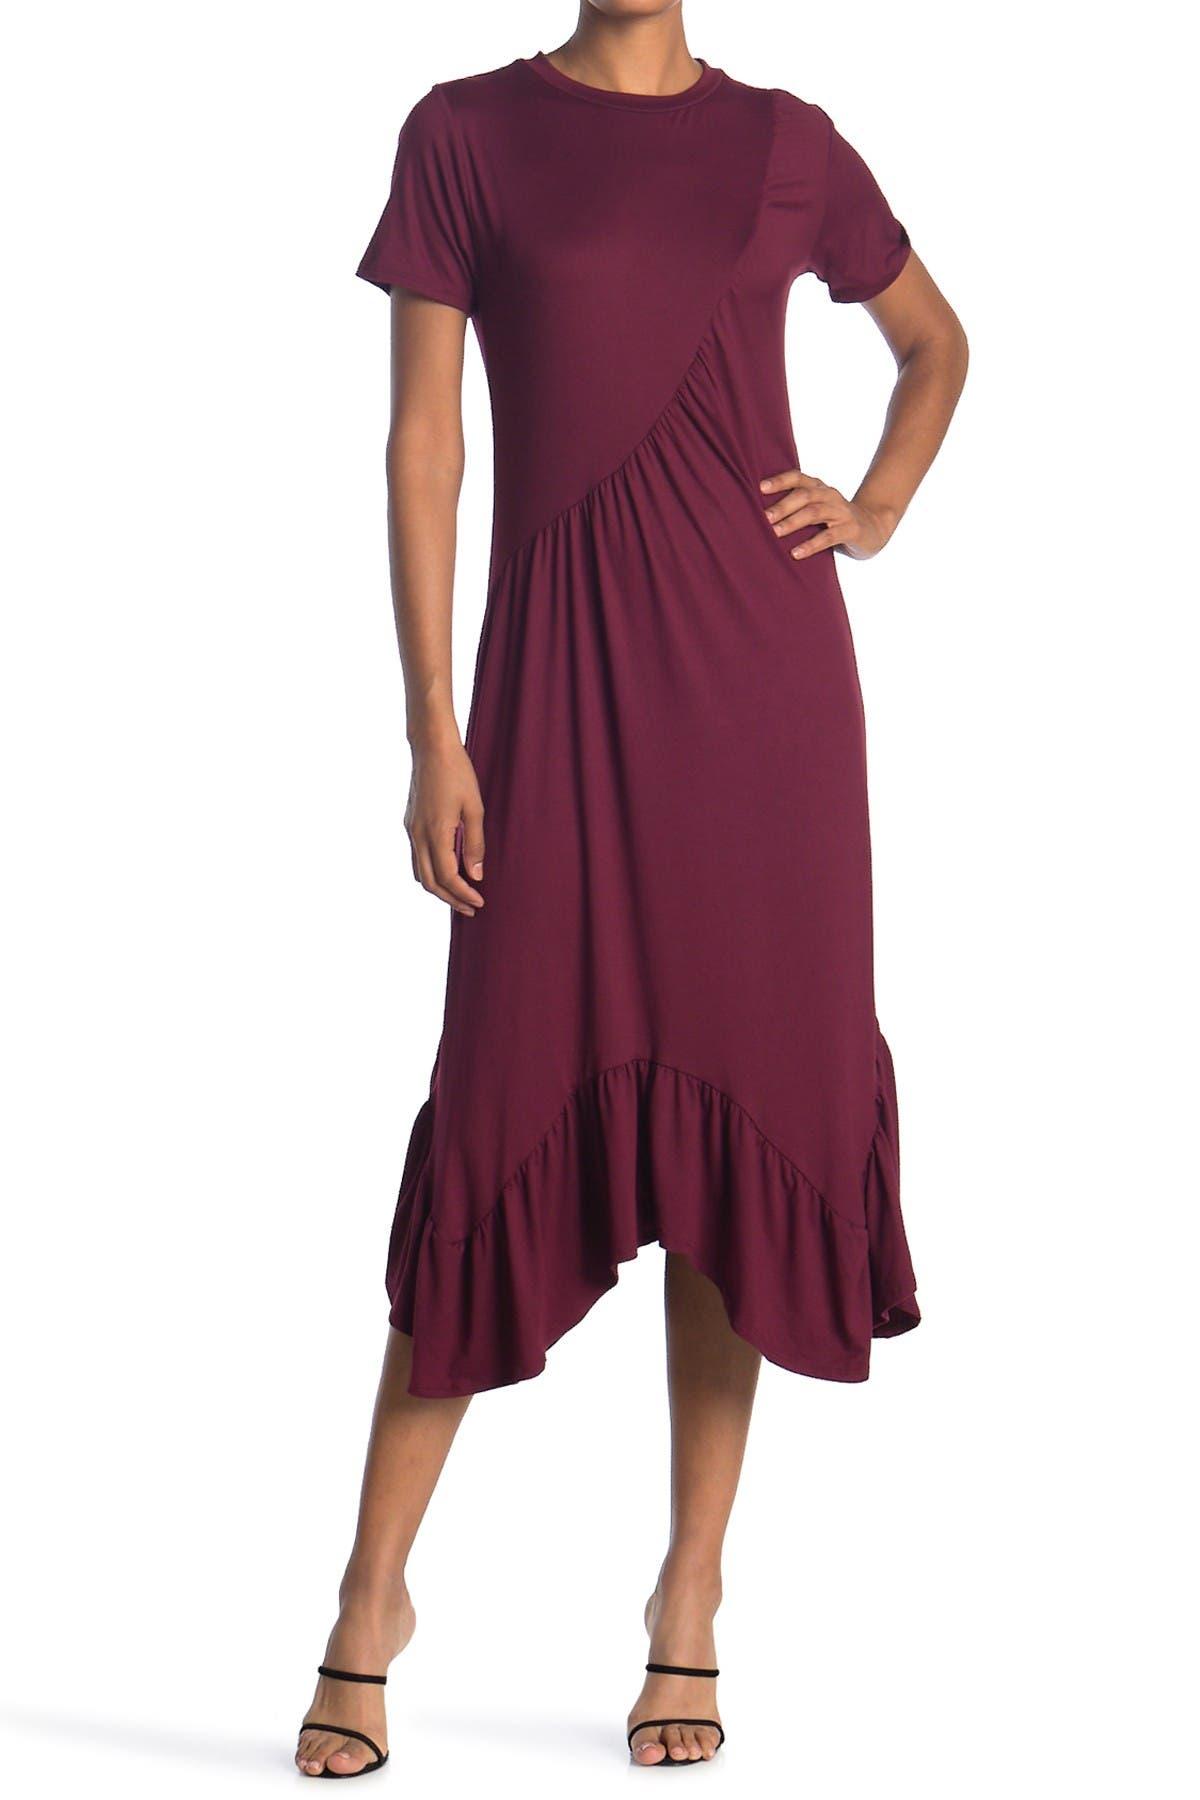 Image of Velvet Torch Asymmetrical Ruffle Maxi Dress